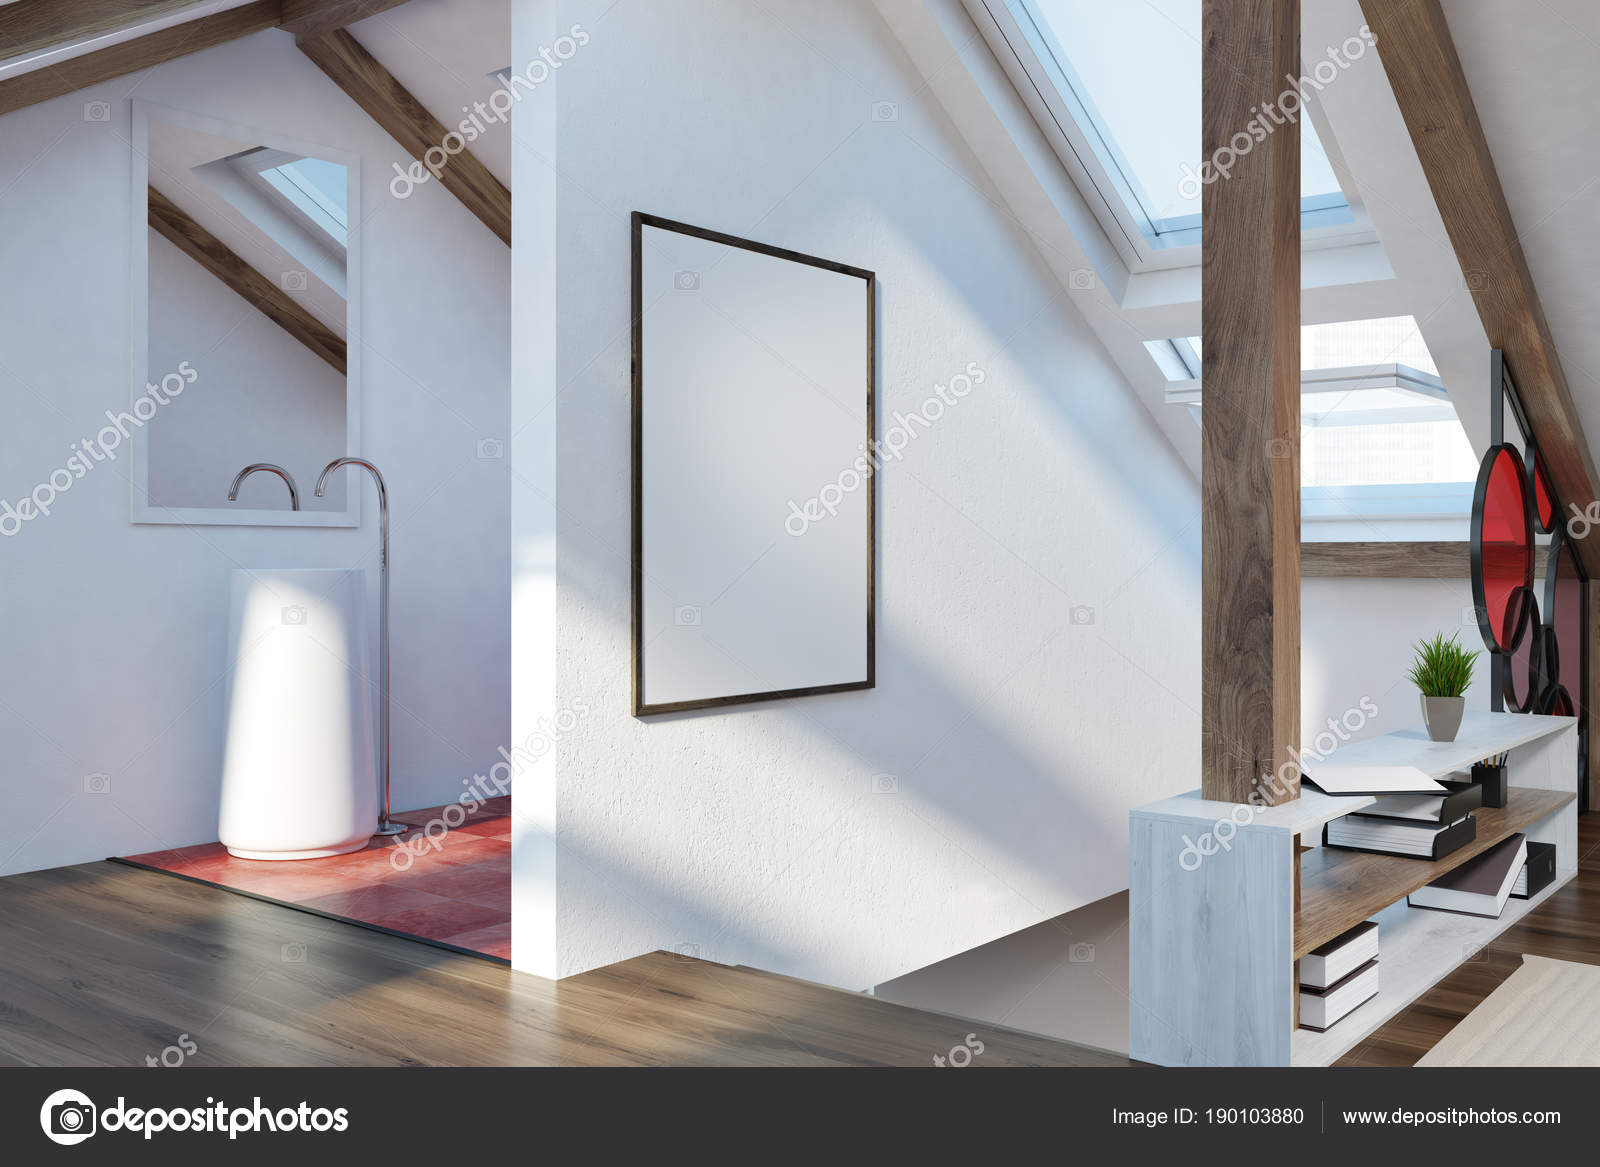 Attic badkamer interieur poster u2014 stockfoto © denisismagilov #190103880